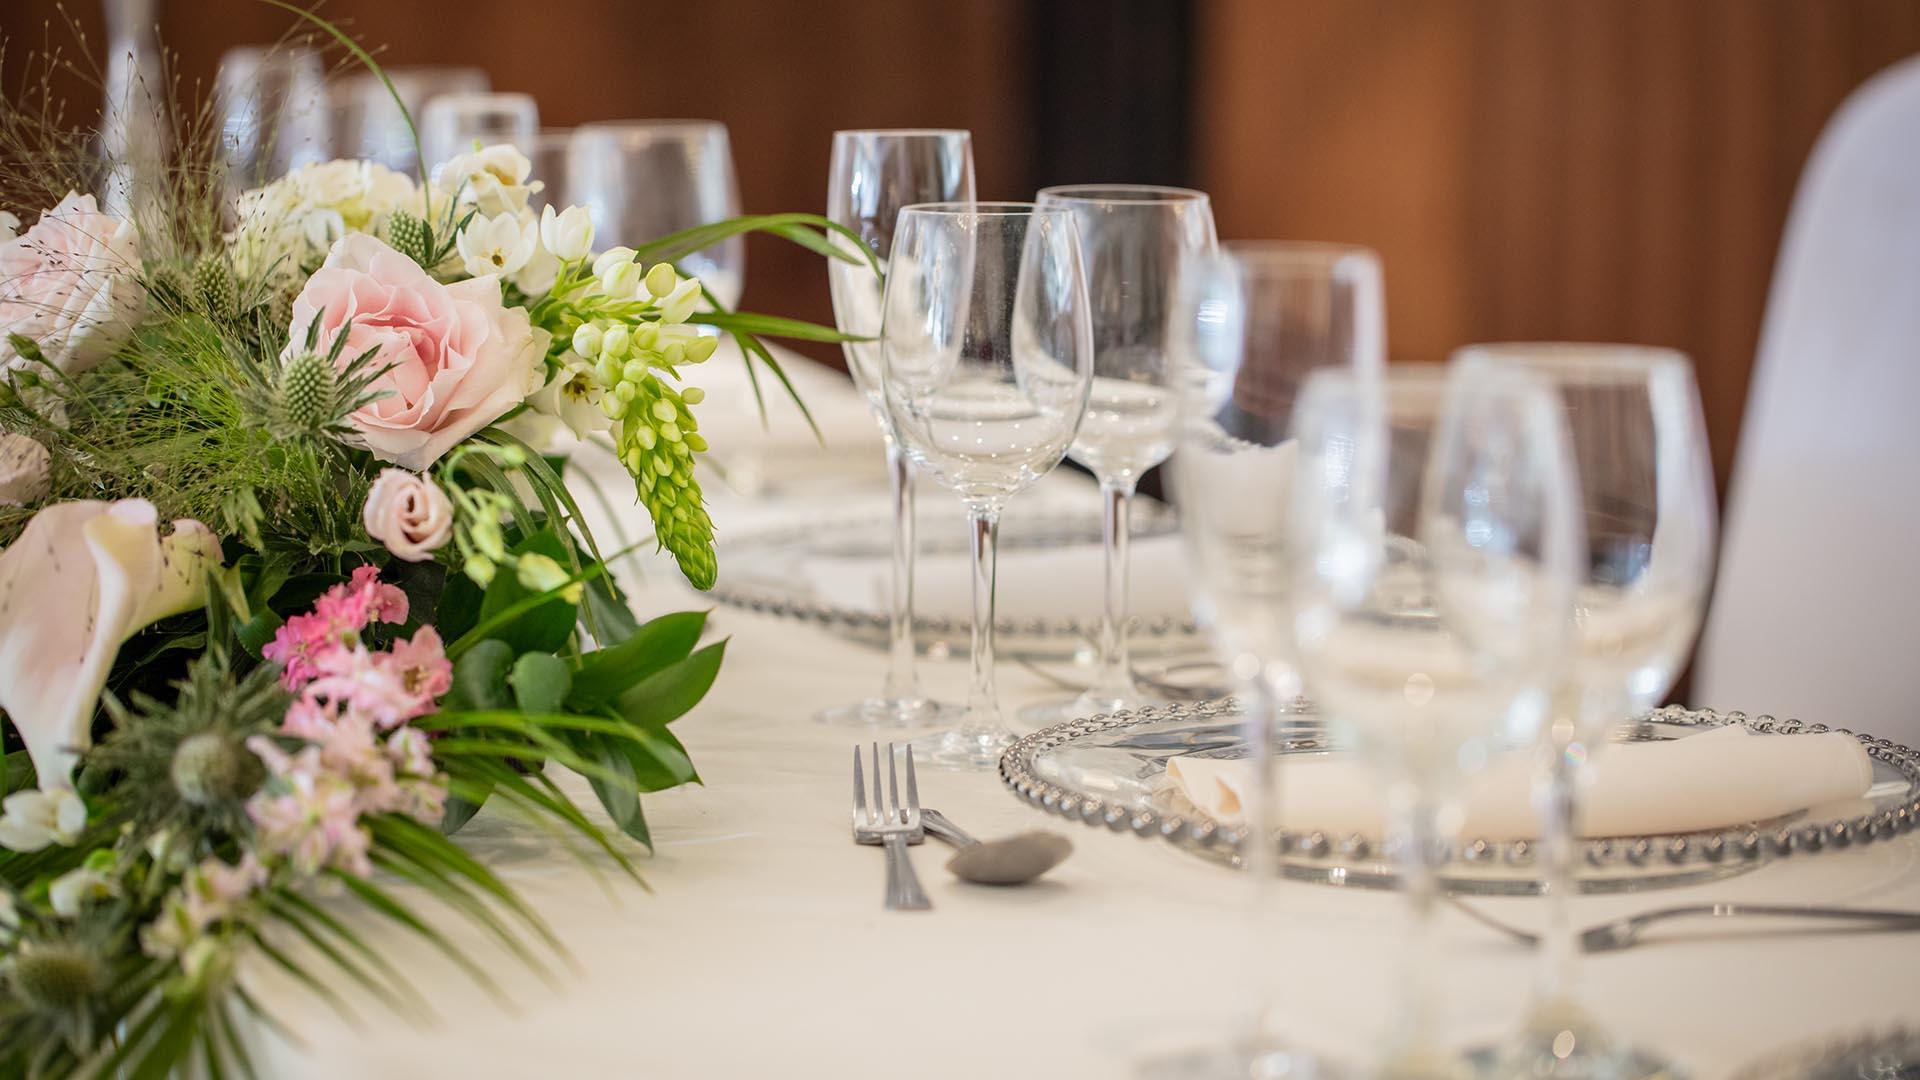 hotelcolessio_Wedding_Ballroom9_510x300